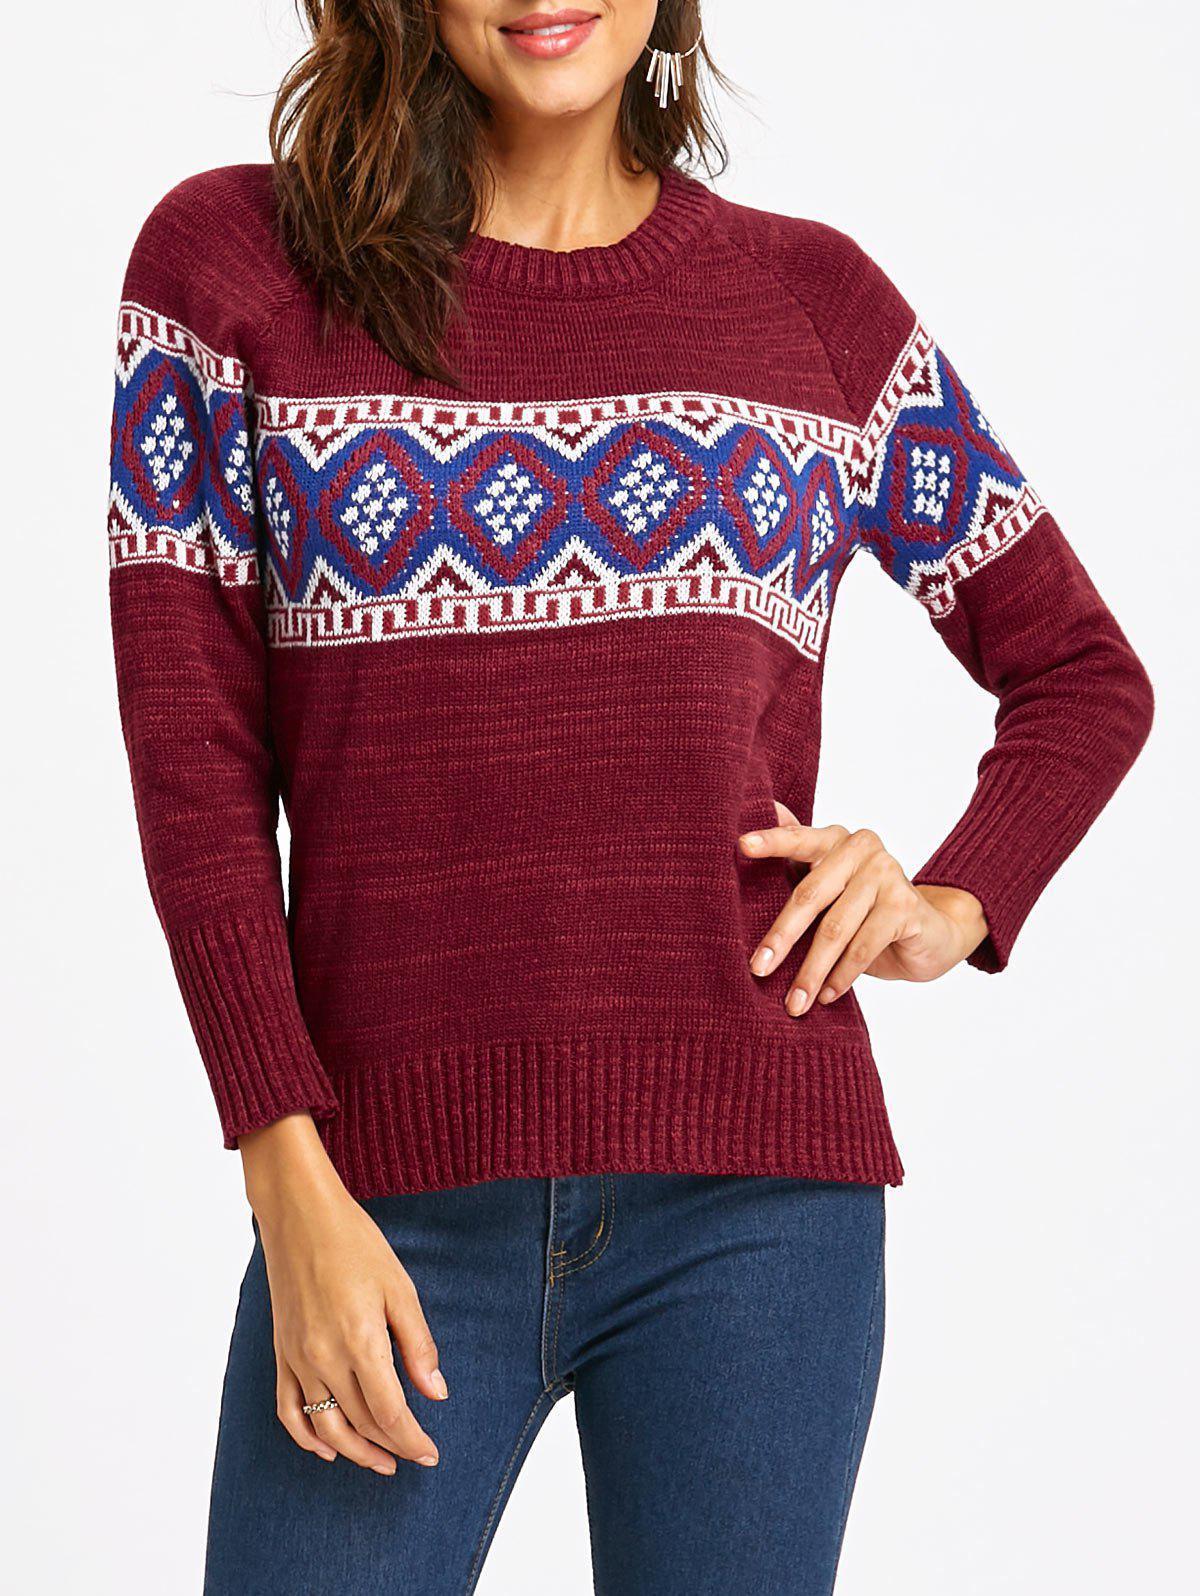 Raglan Sleeve Rhombus Sweater 234220502